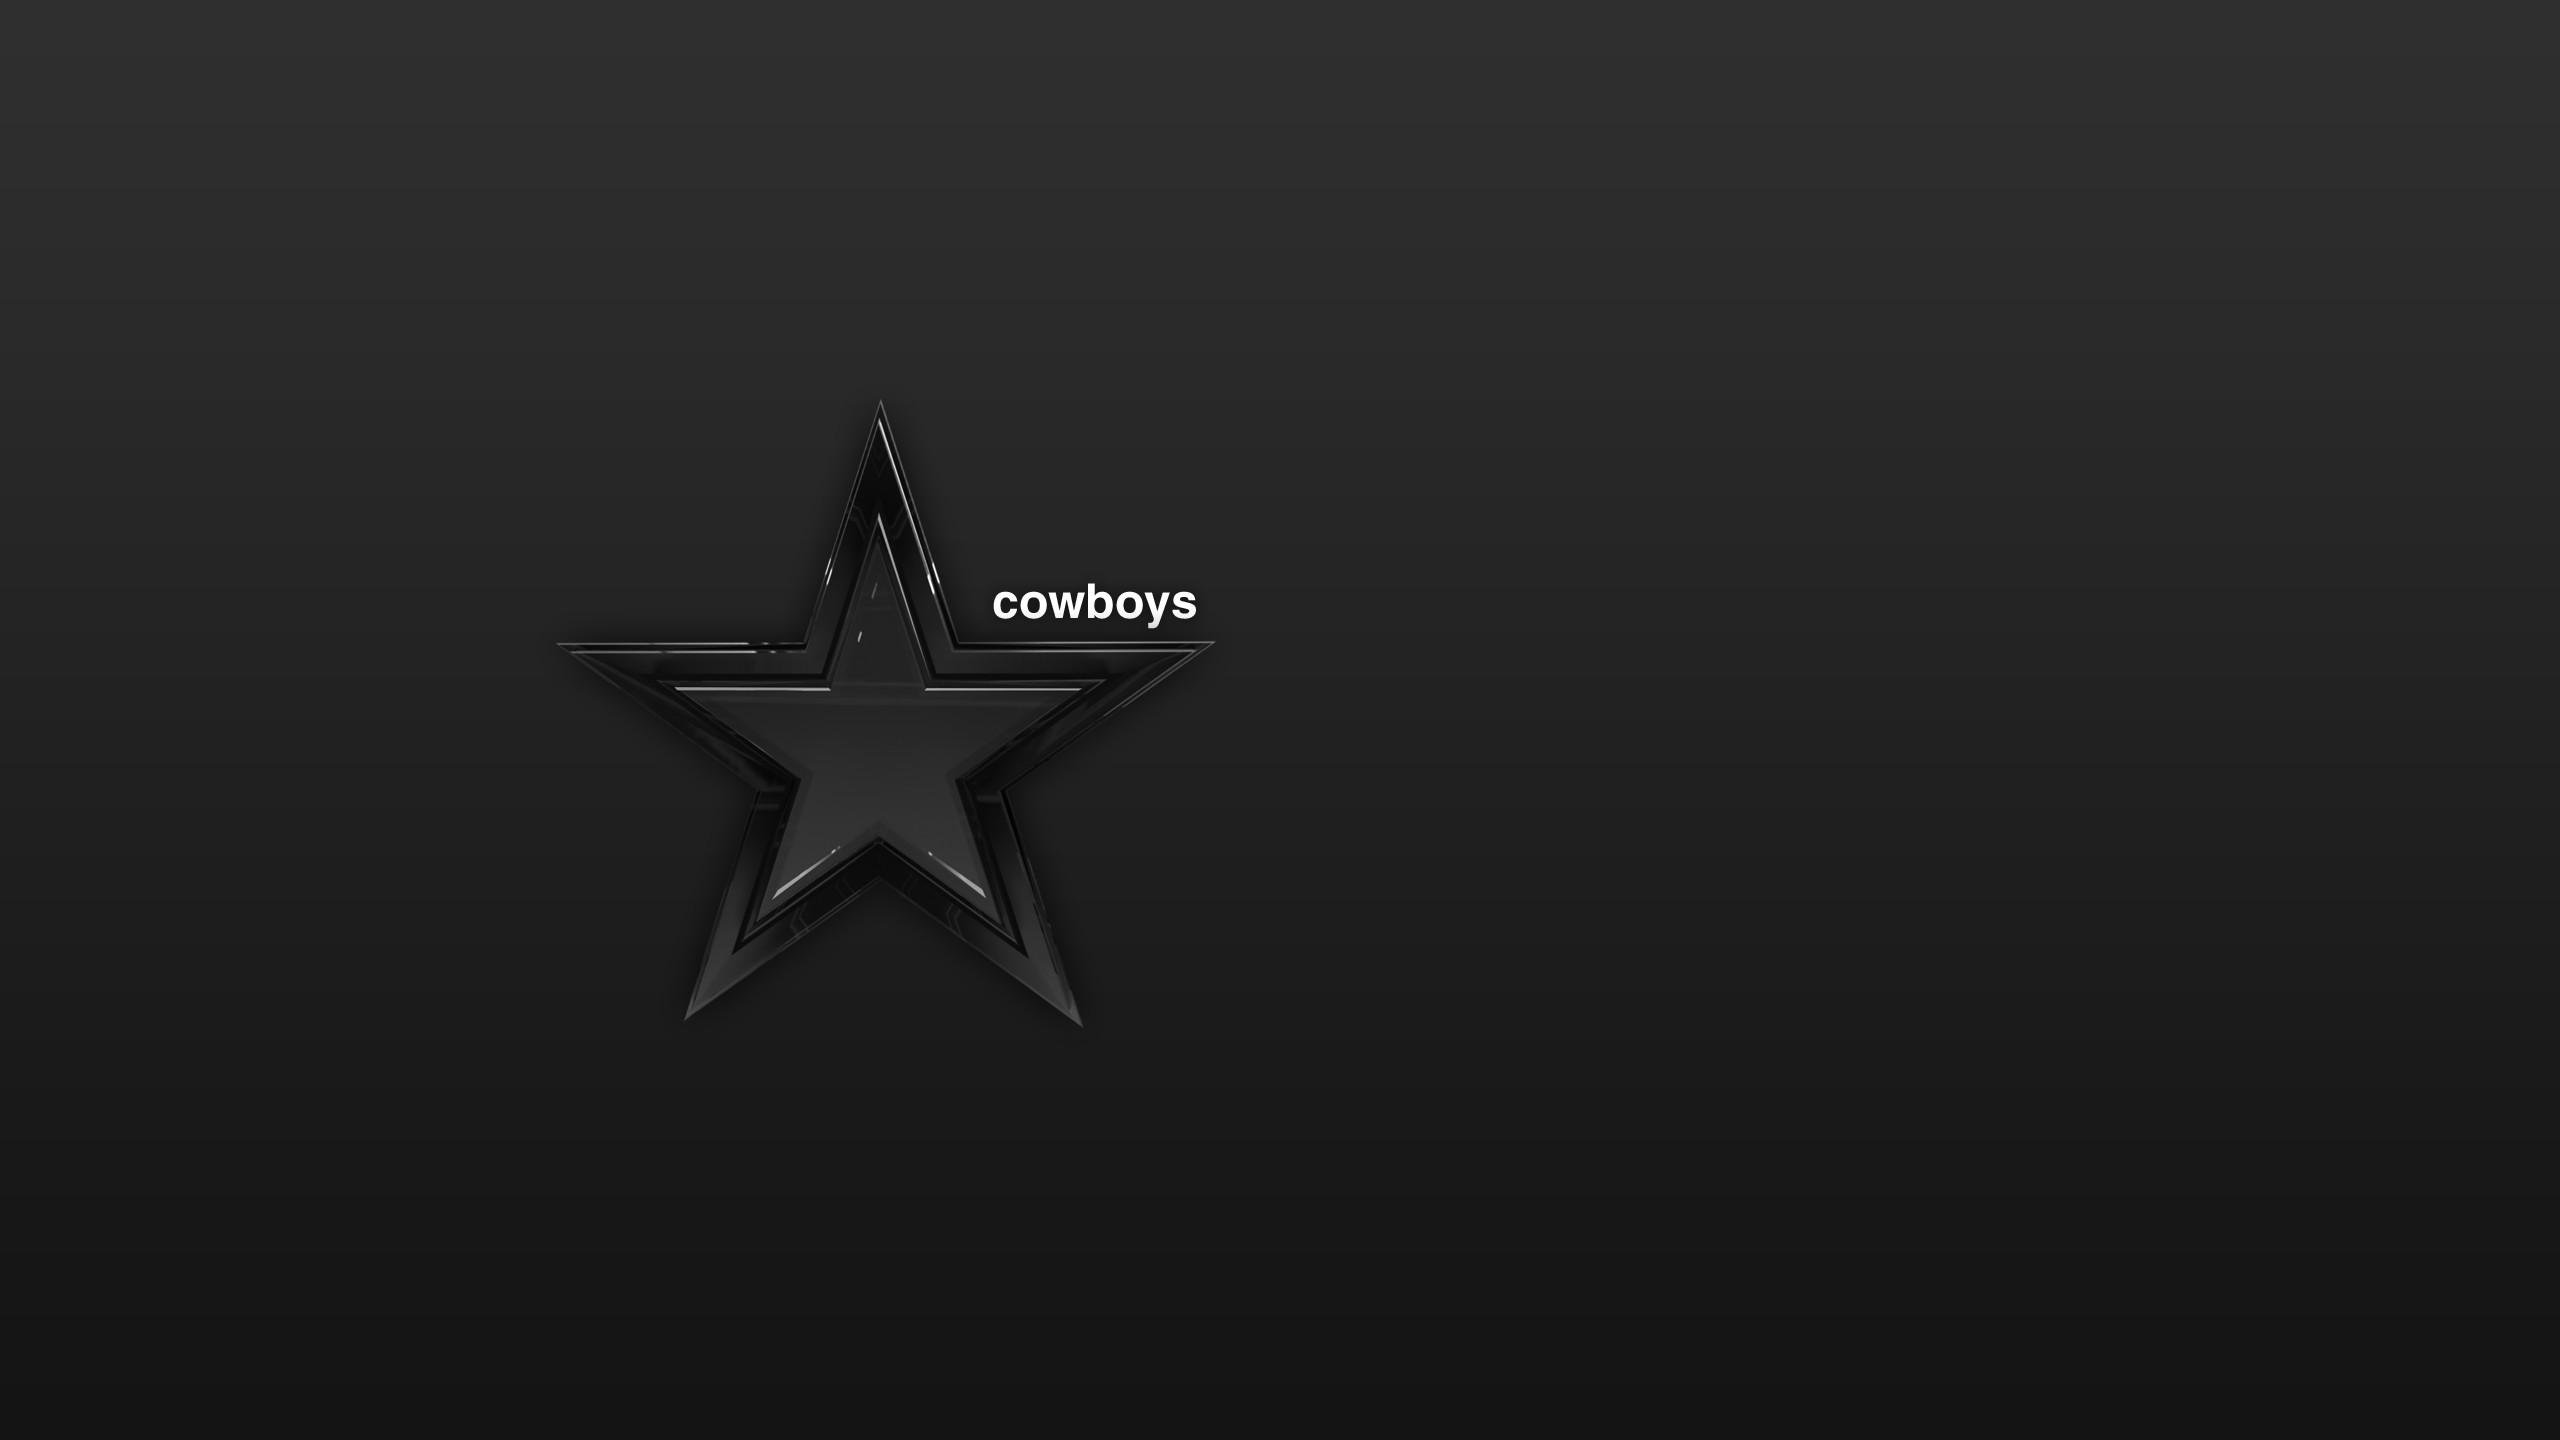 dallas-cowboy-hd-free-download-wallpaper-wp4203326